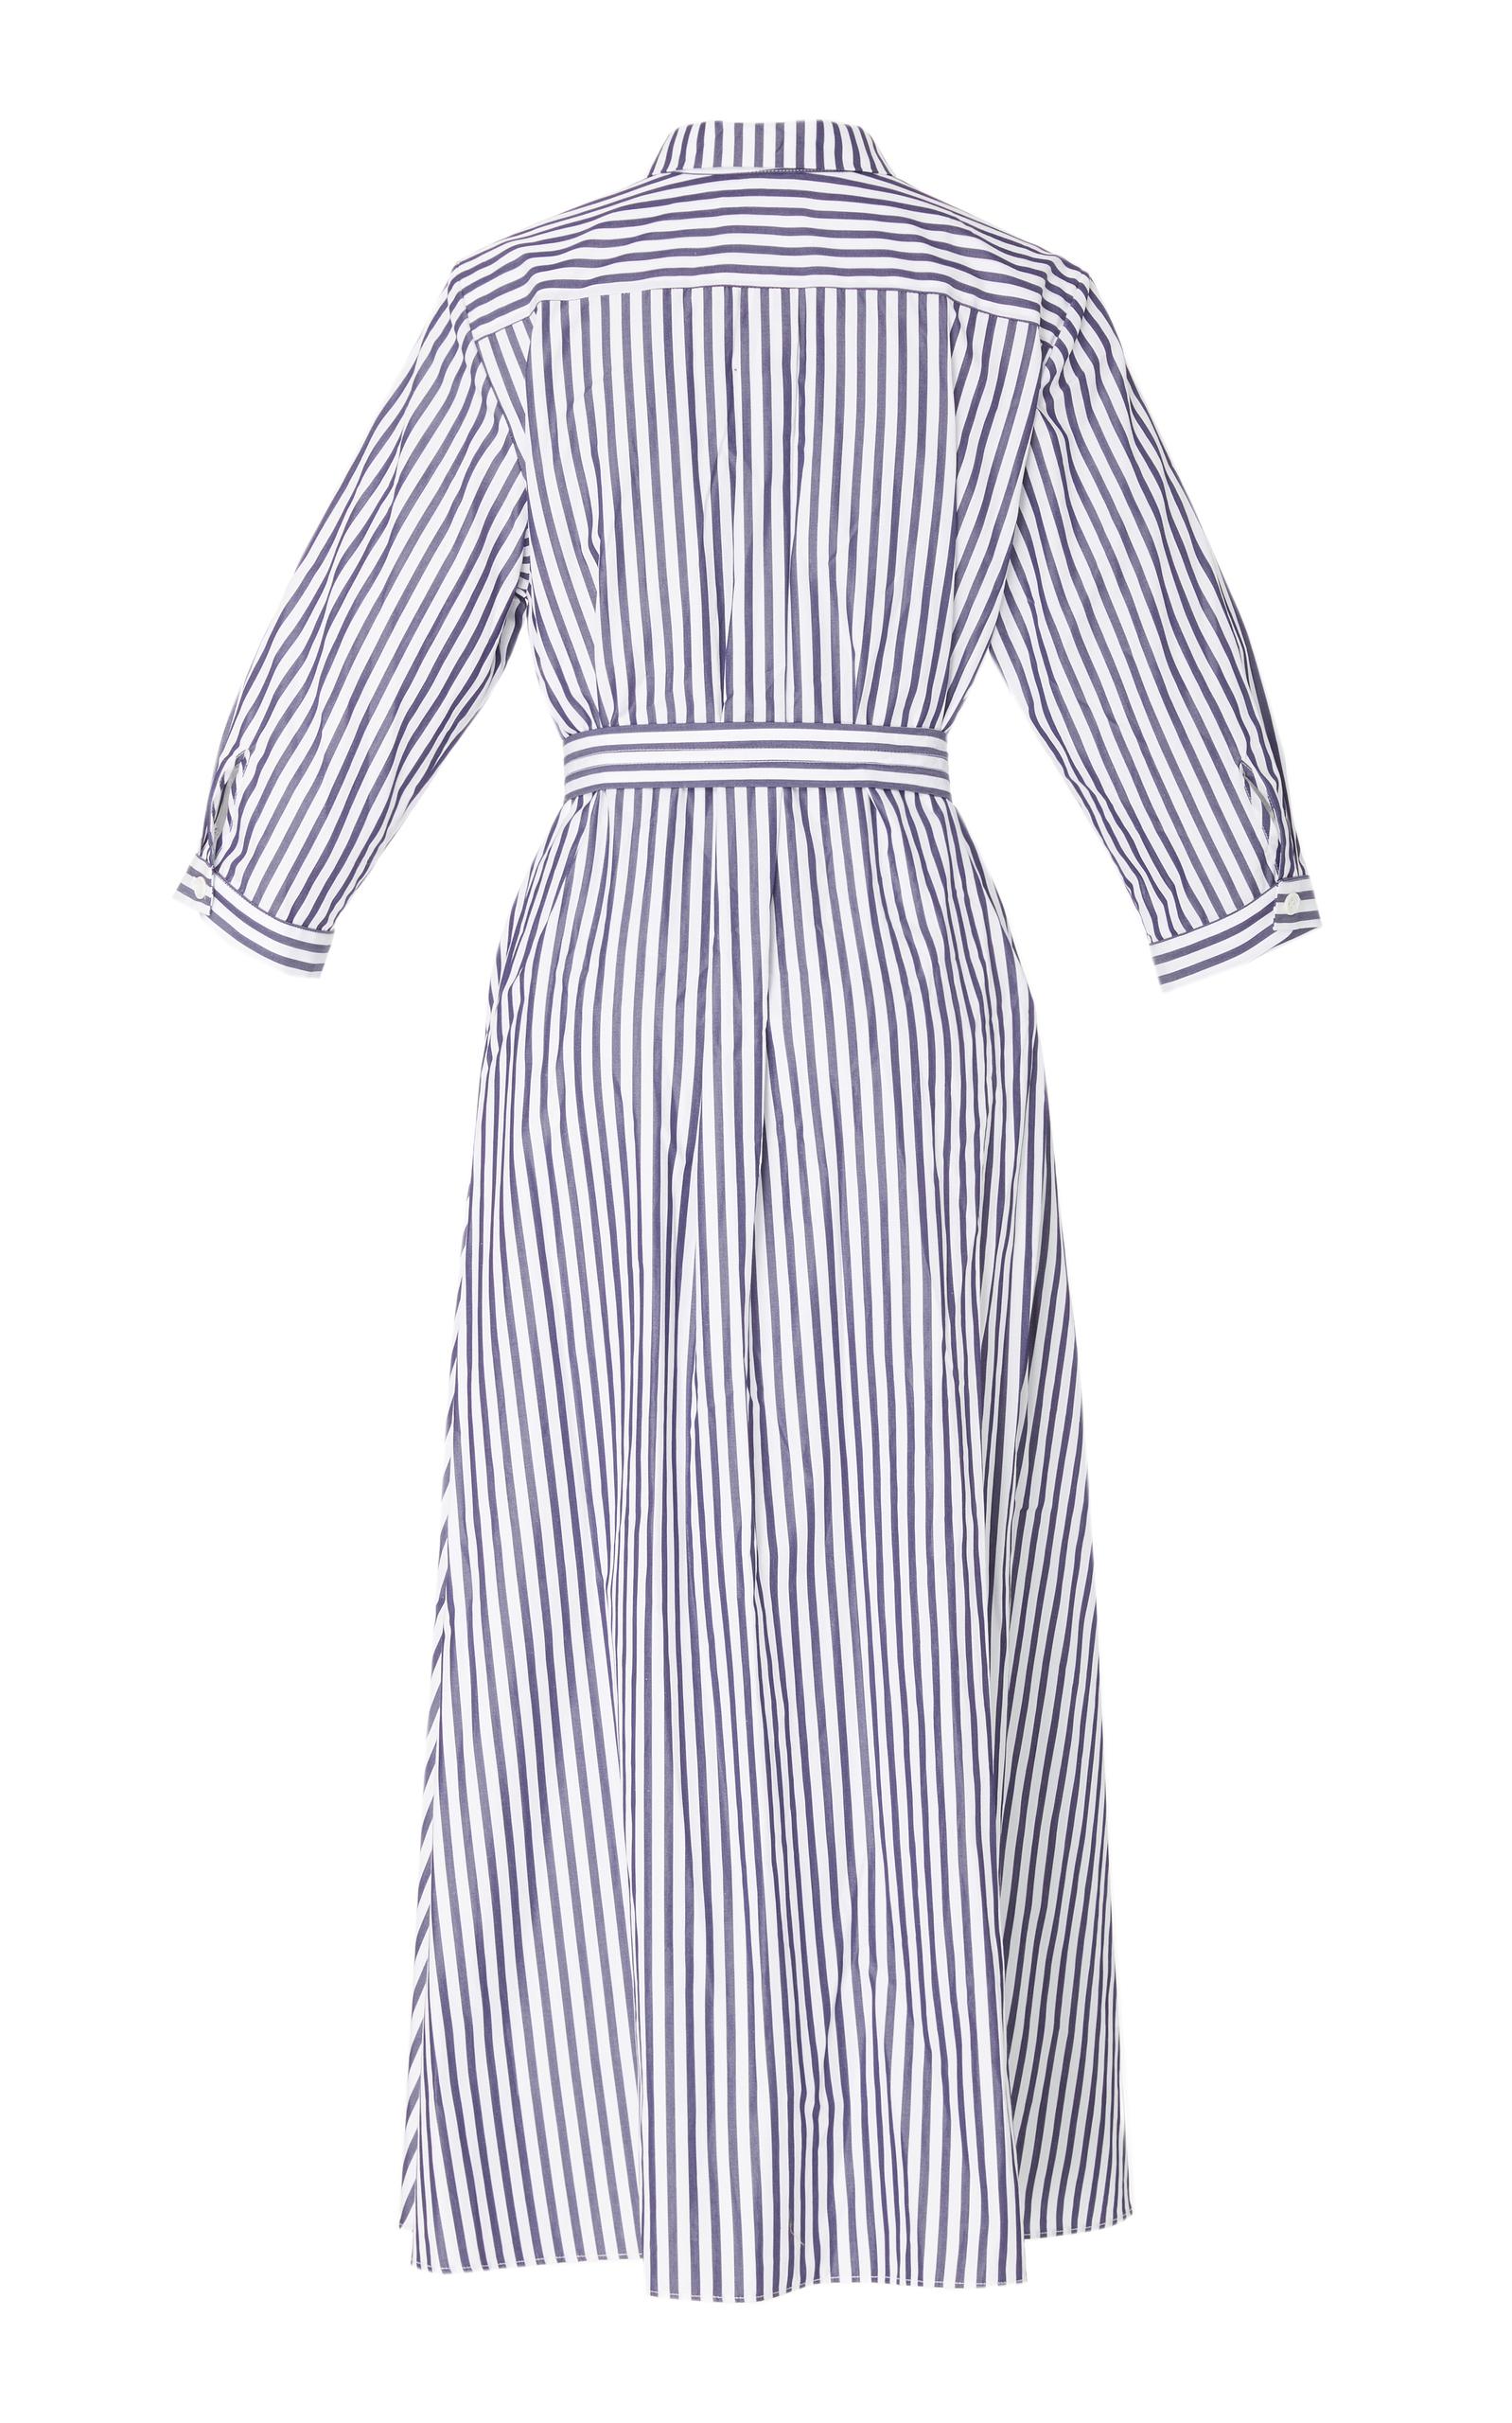 9ba12c51d5 Button Down Shirtdress by MDS Stripes